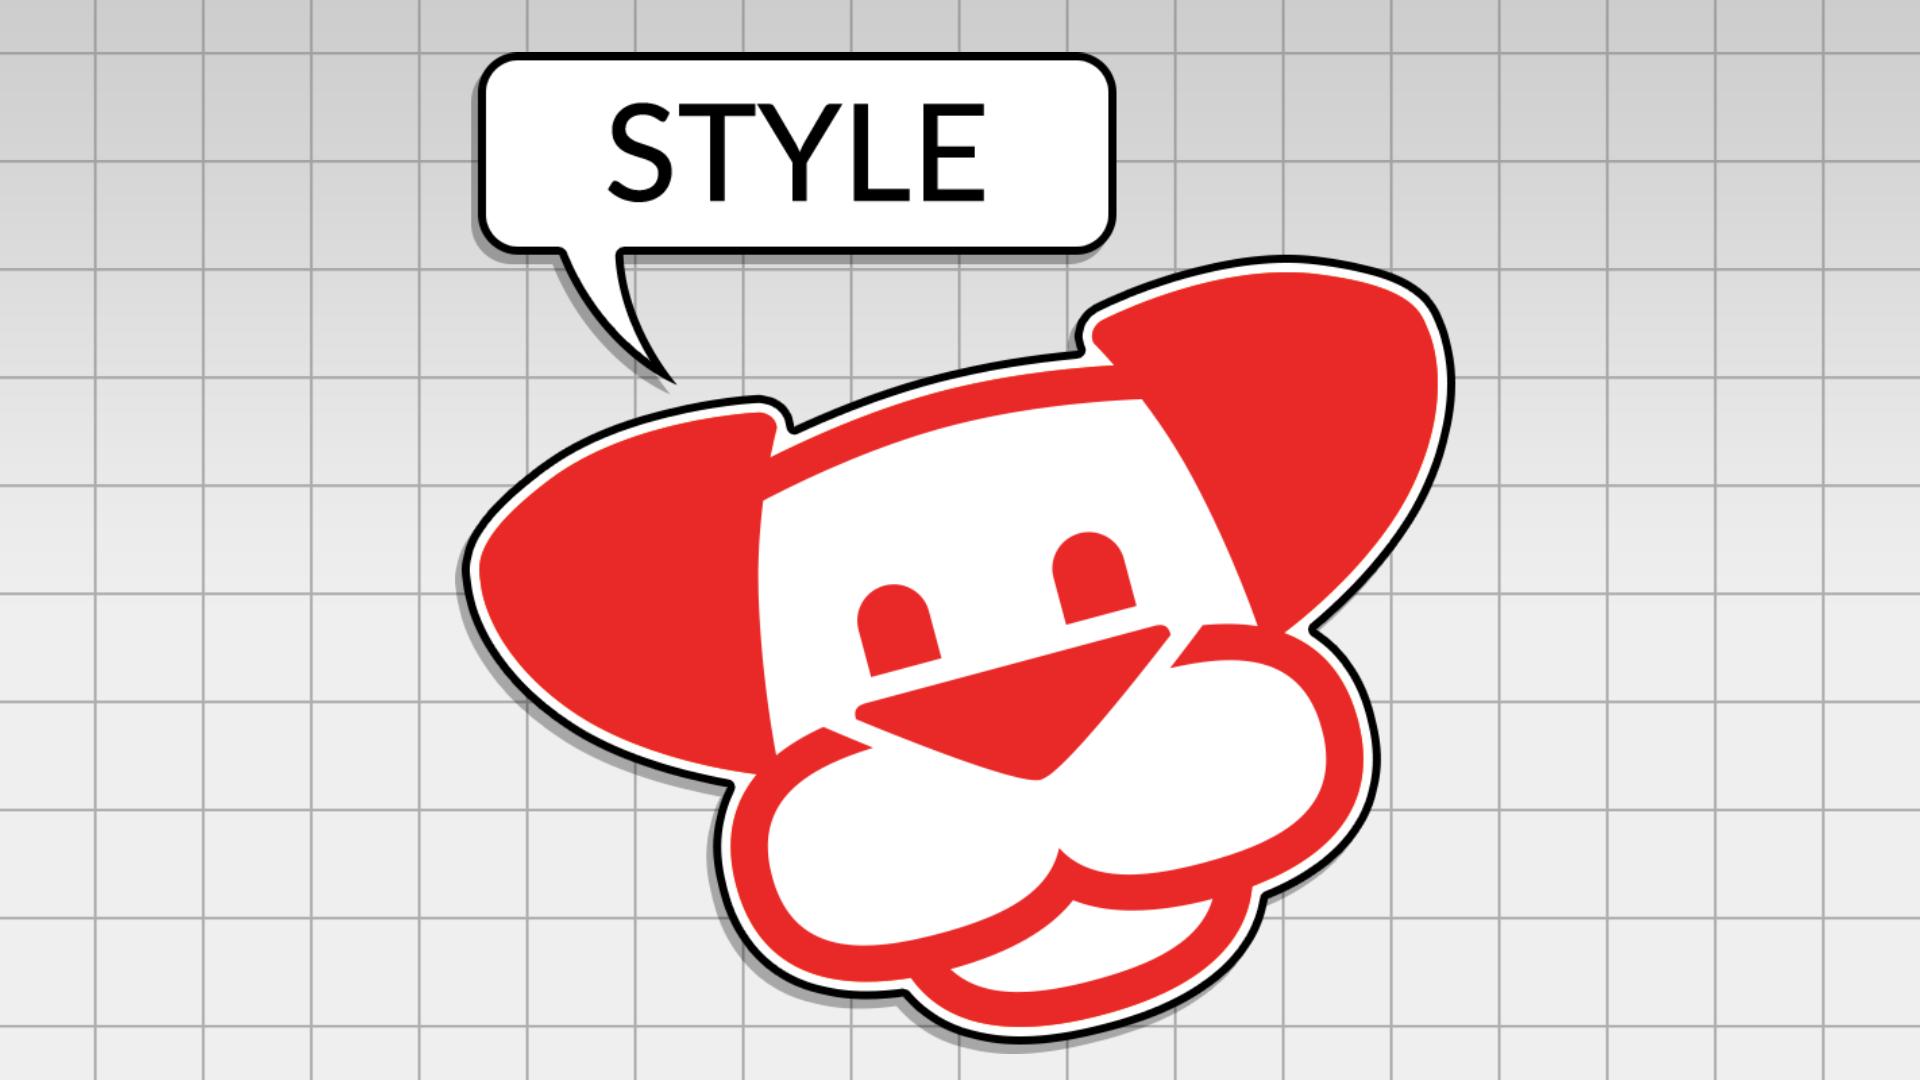 Icon for Bonus Points for STYLE